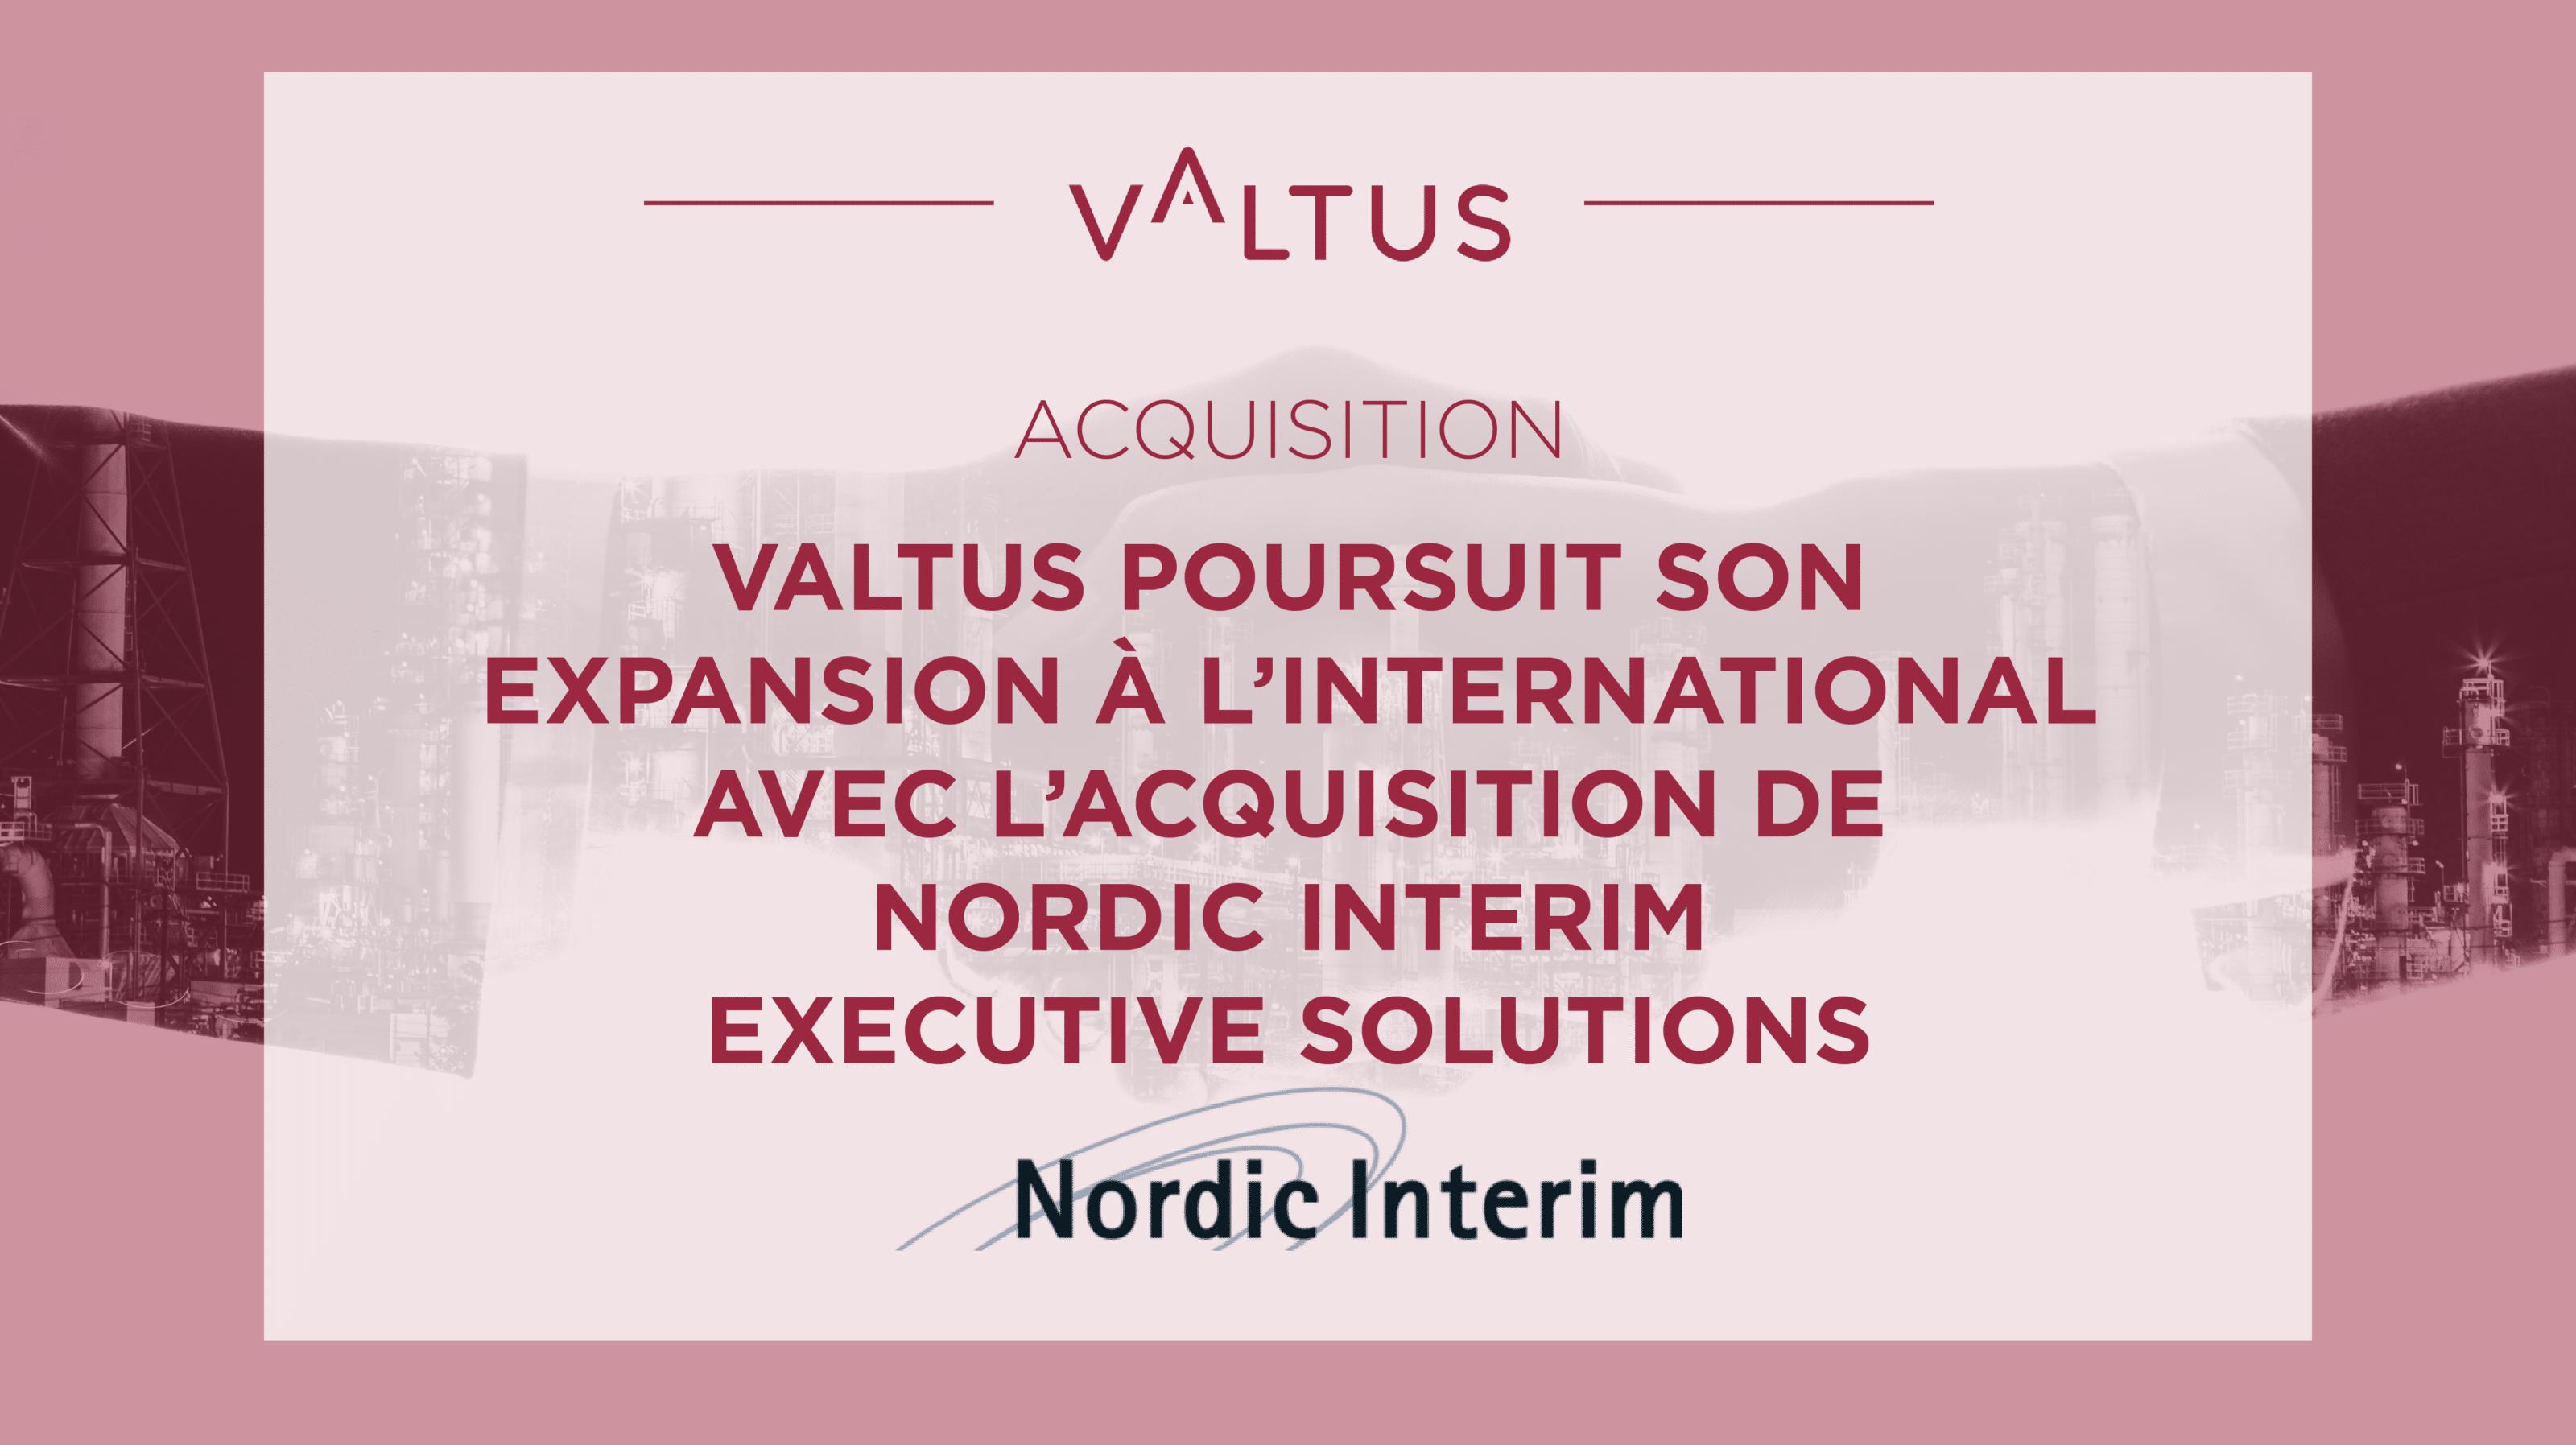 Valtus fait l'acquisition de Nordic Interim Executive Solutions